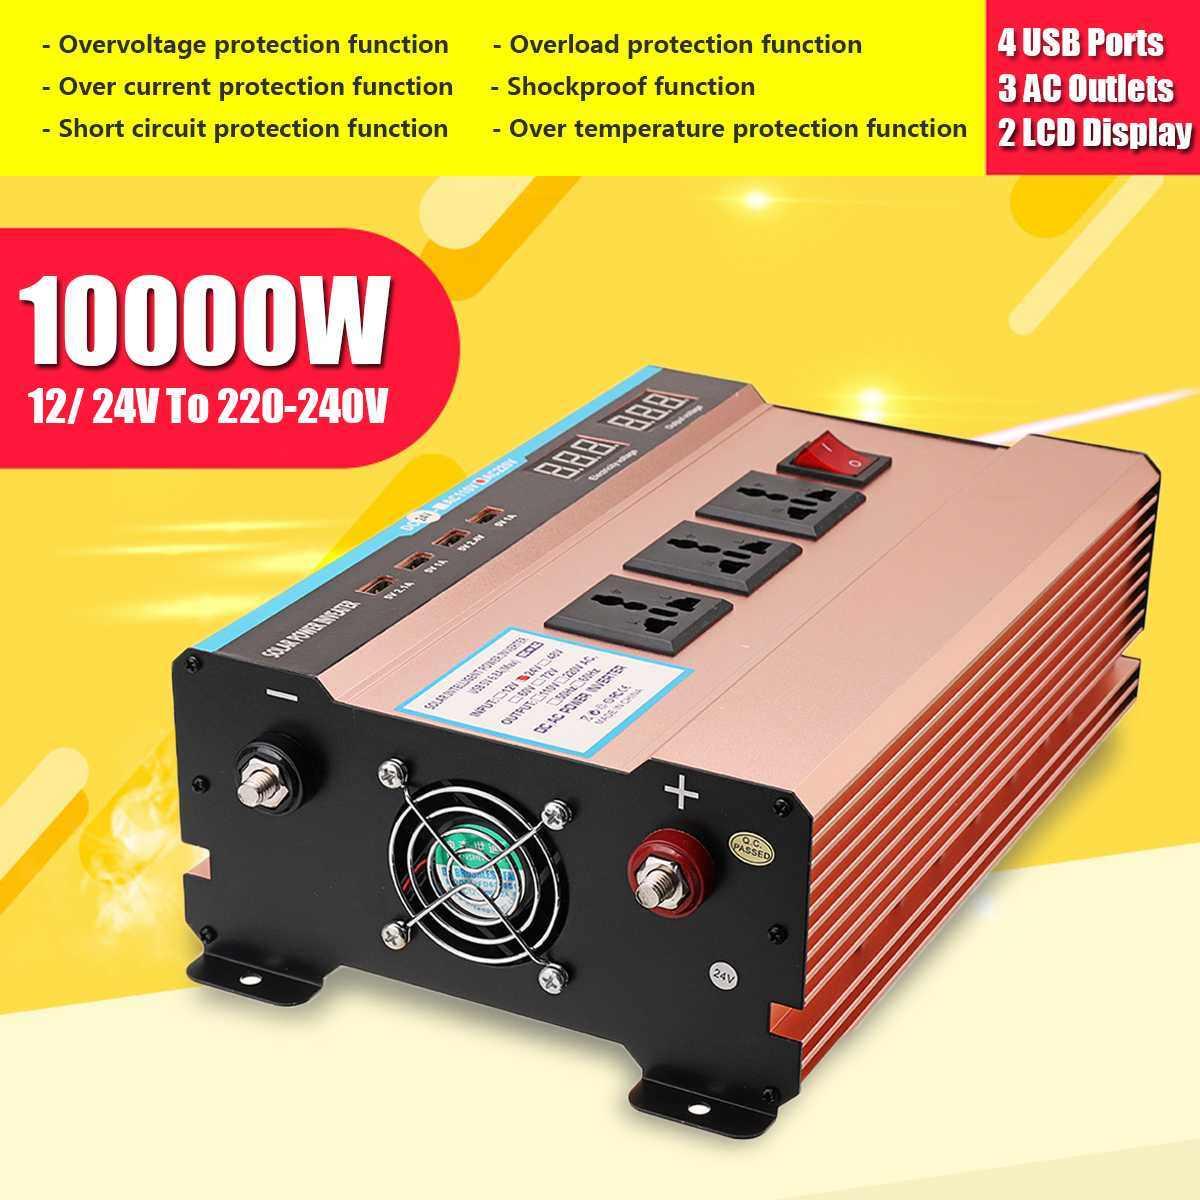 160watt Modified Power Inverter Ddoxin Brand High Frequency Circuit